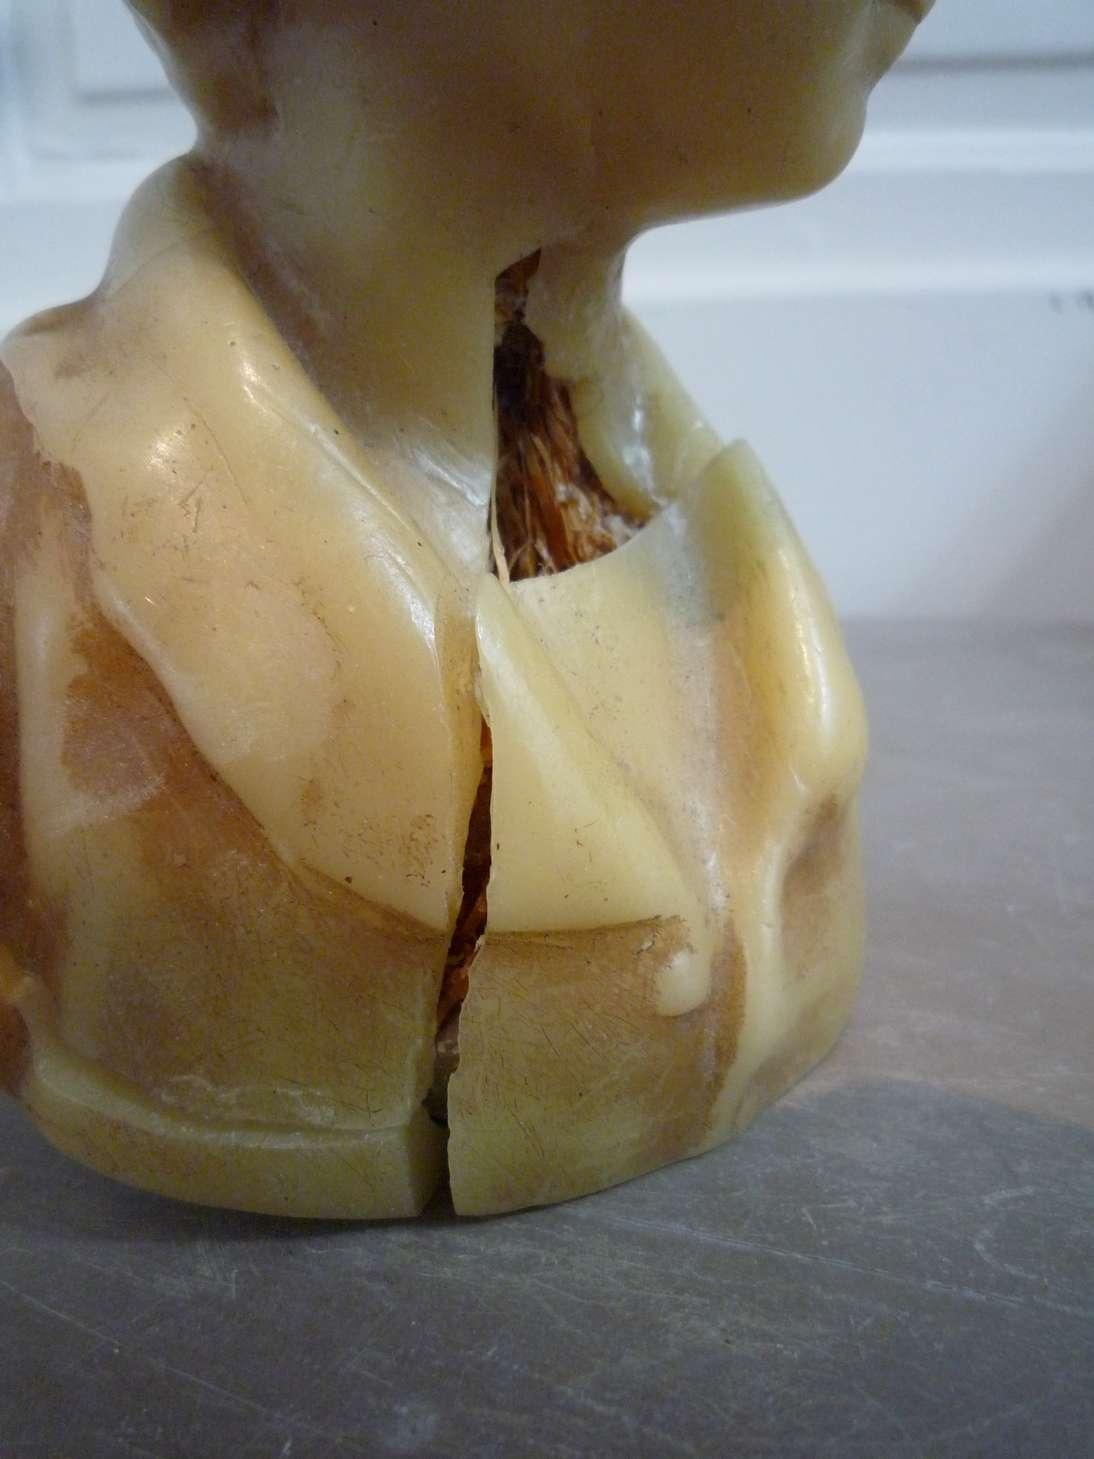 Alexandre-brongniart-buste-cire-sculpture-enfant-louise-houdon-sèvres-art-restauration-restaurarte-reparation.jpg